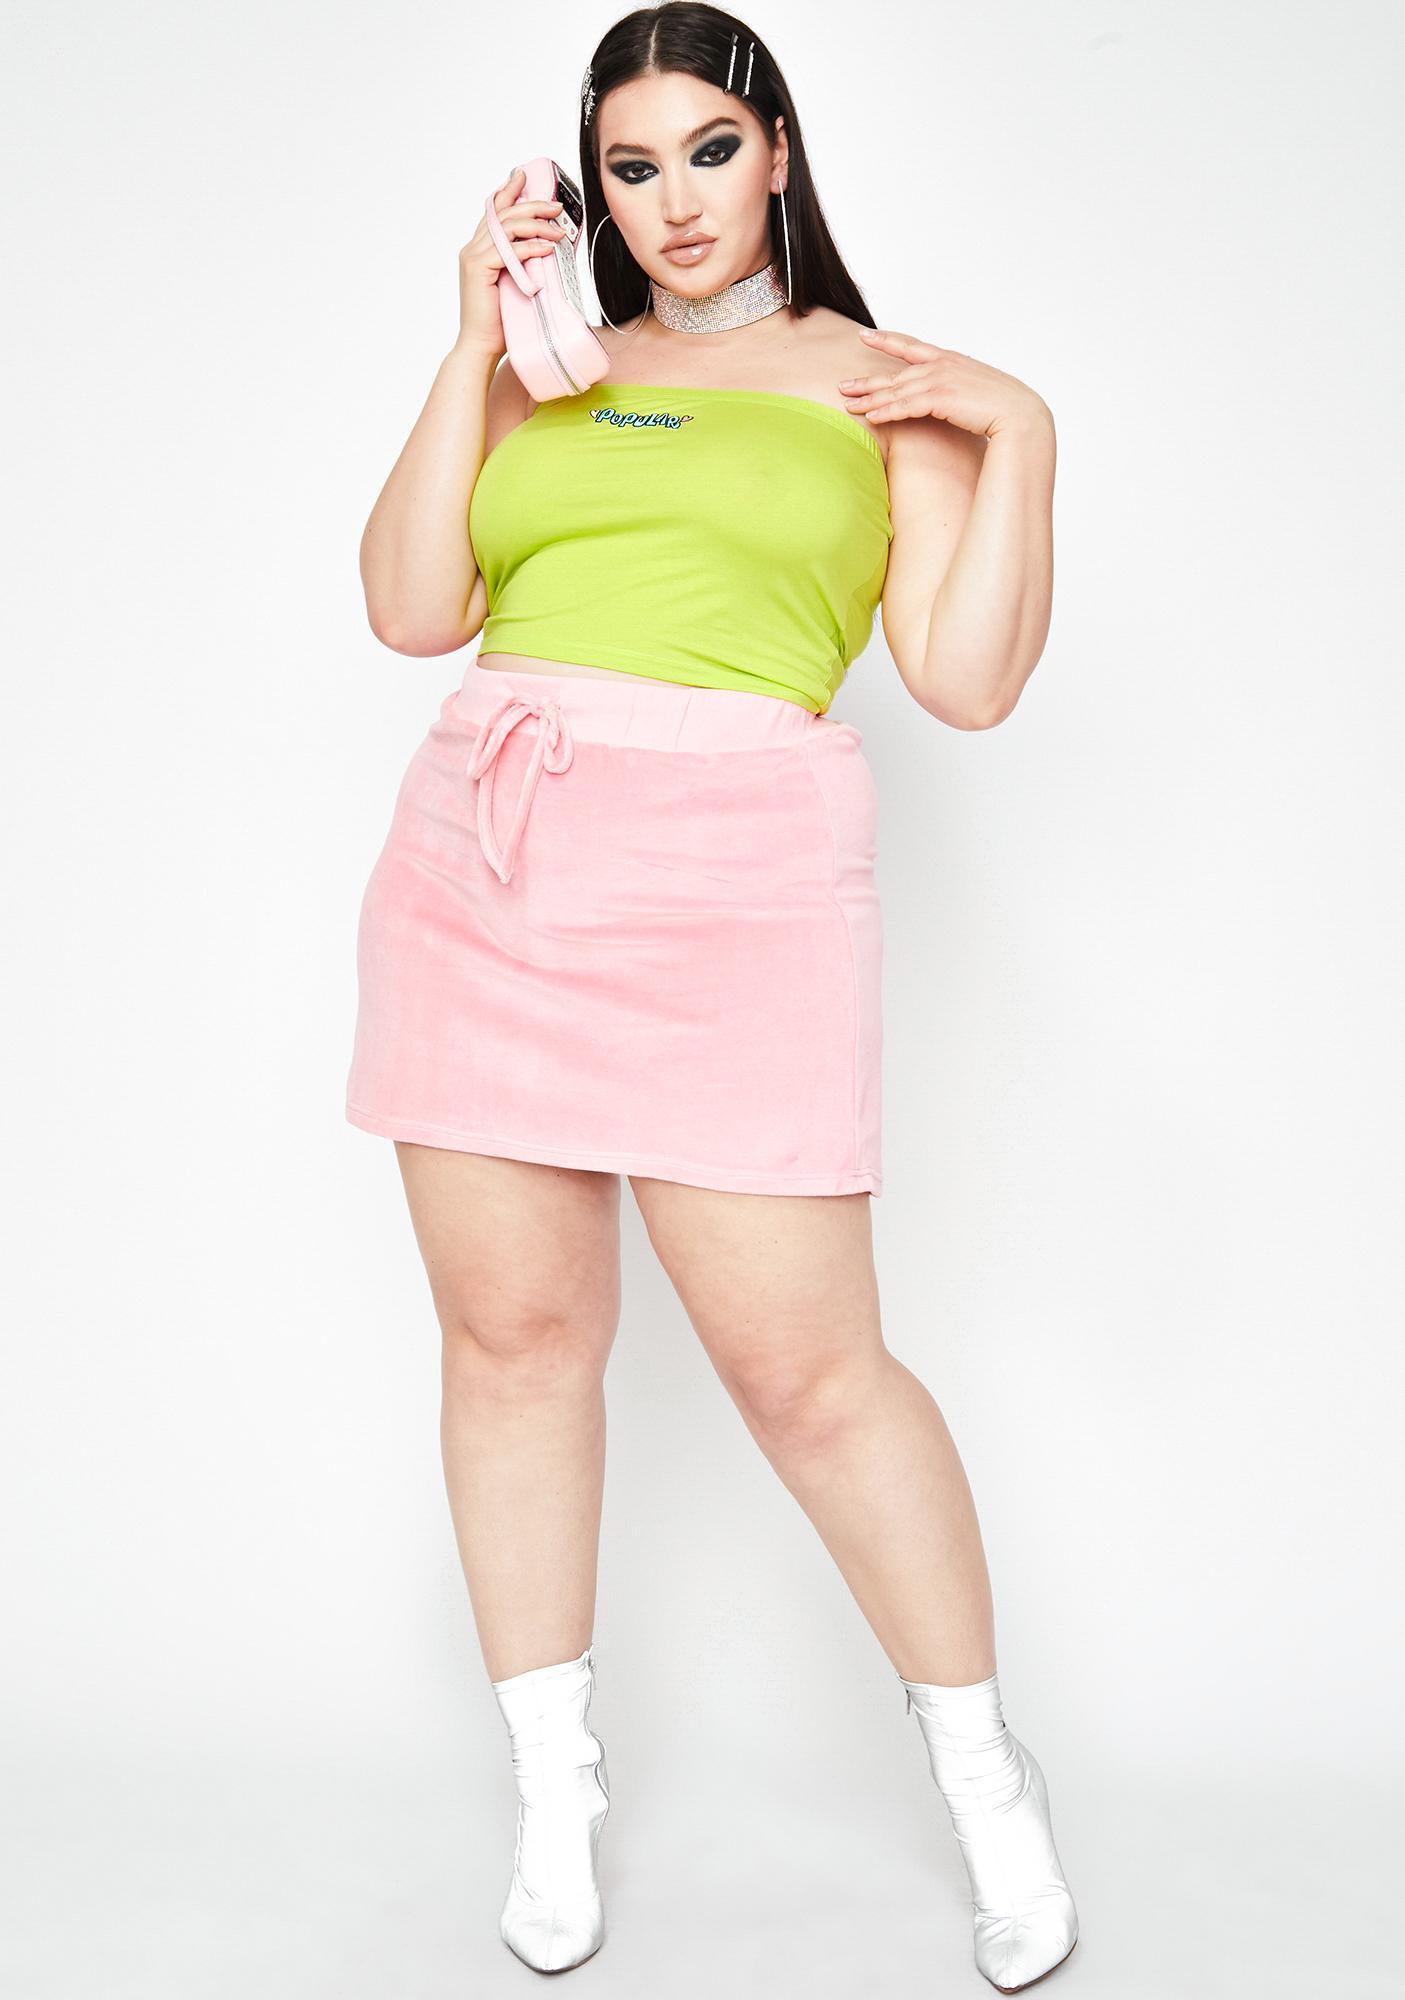 HOROSCOPEZ Miss Sassy Socialite Tube Top